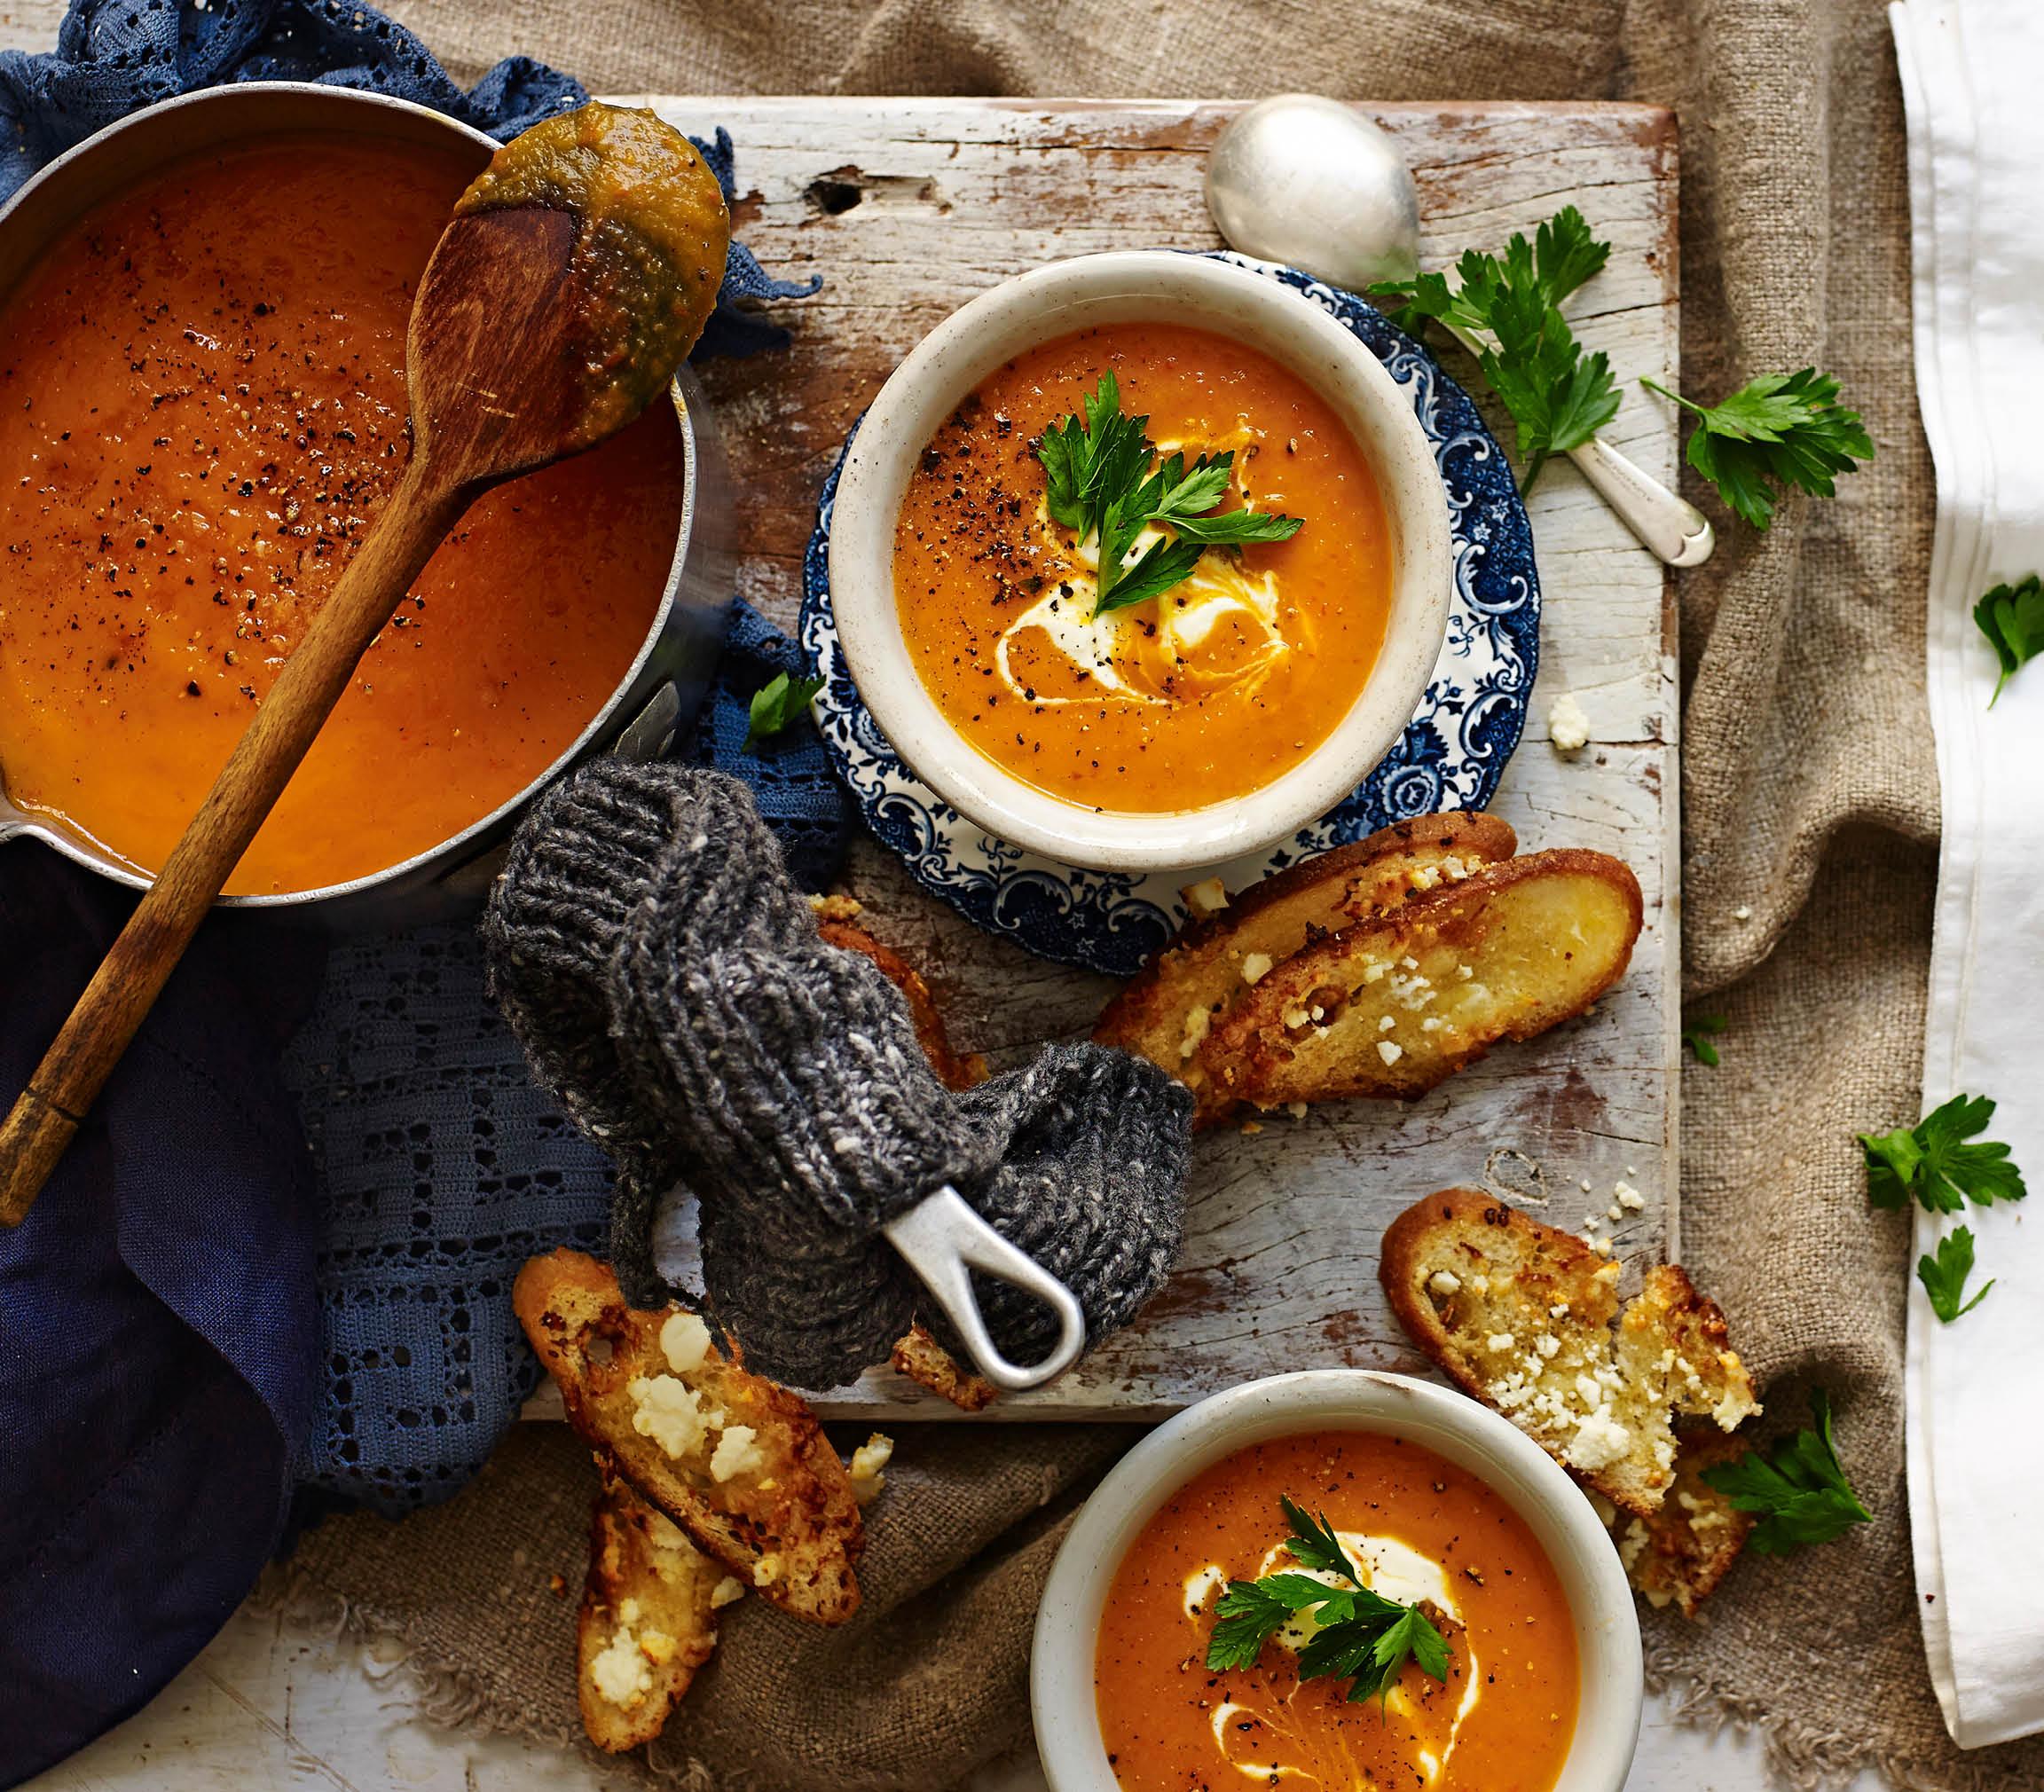 CH4801_Charter Hall_National_Recipes Winter 2019_Social Tiles_Pumpkin Soup_Facebook Post_FA